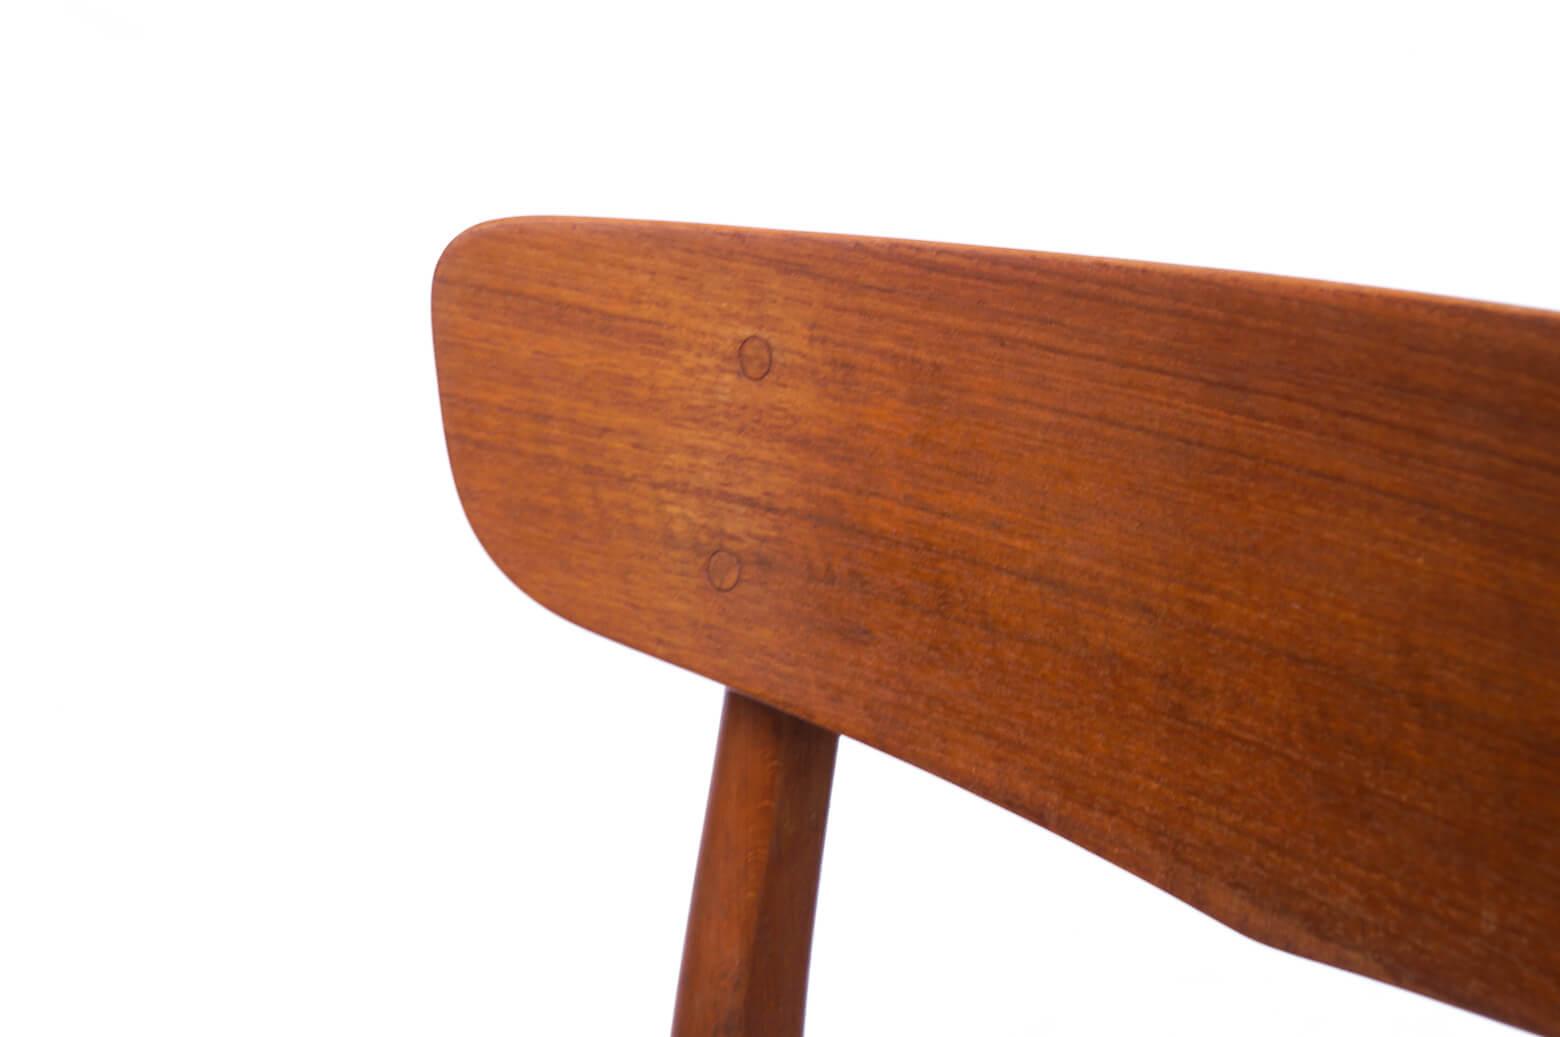 Danish Farstrup Møbelfabrik Dining chair/デンマーク ヴィンテージ ダイニングチェア ブルー 2